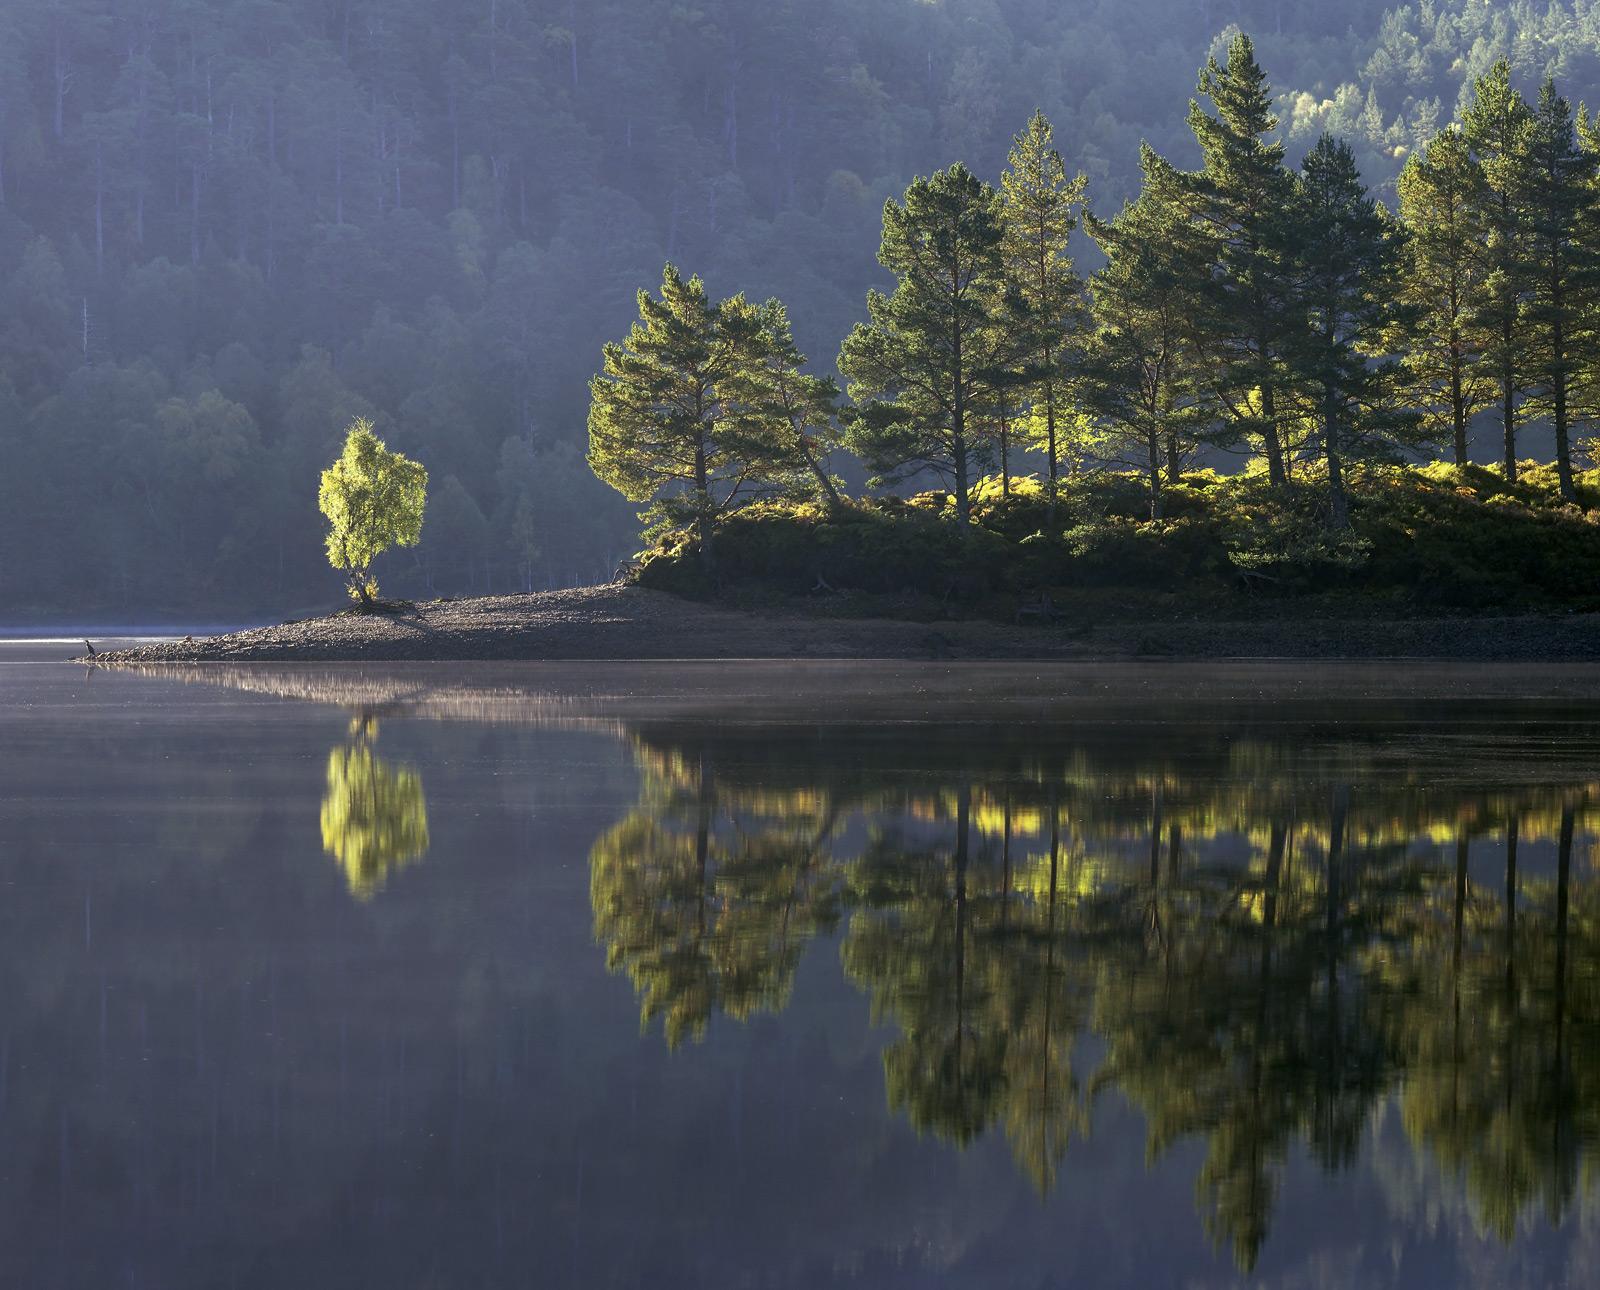 Glen Affric Mirror, Glen Affric, Highland, Scotland, birch, Scots pine, canopy, green, reflection, double, autumnal, shi, photo